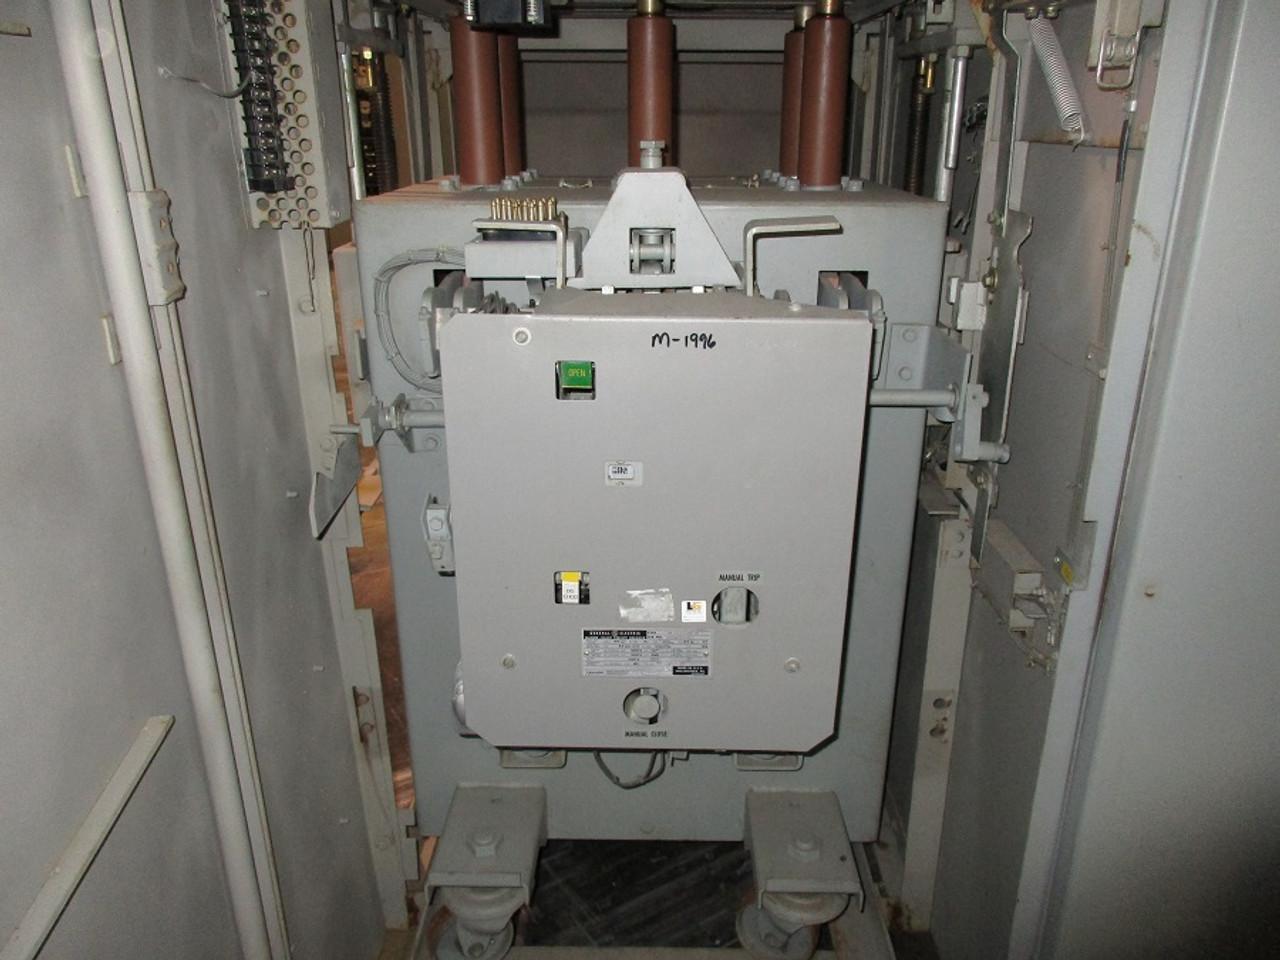 am 13 8 500 7h ge magne blast 1200a 15kv air circuit breaker (in  am 13 8 500 7h ge magne blast 1200a 15kv air circuit breaker (in structure) bullock breakers